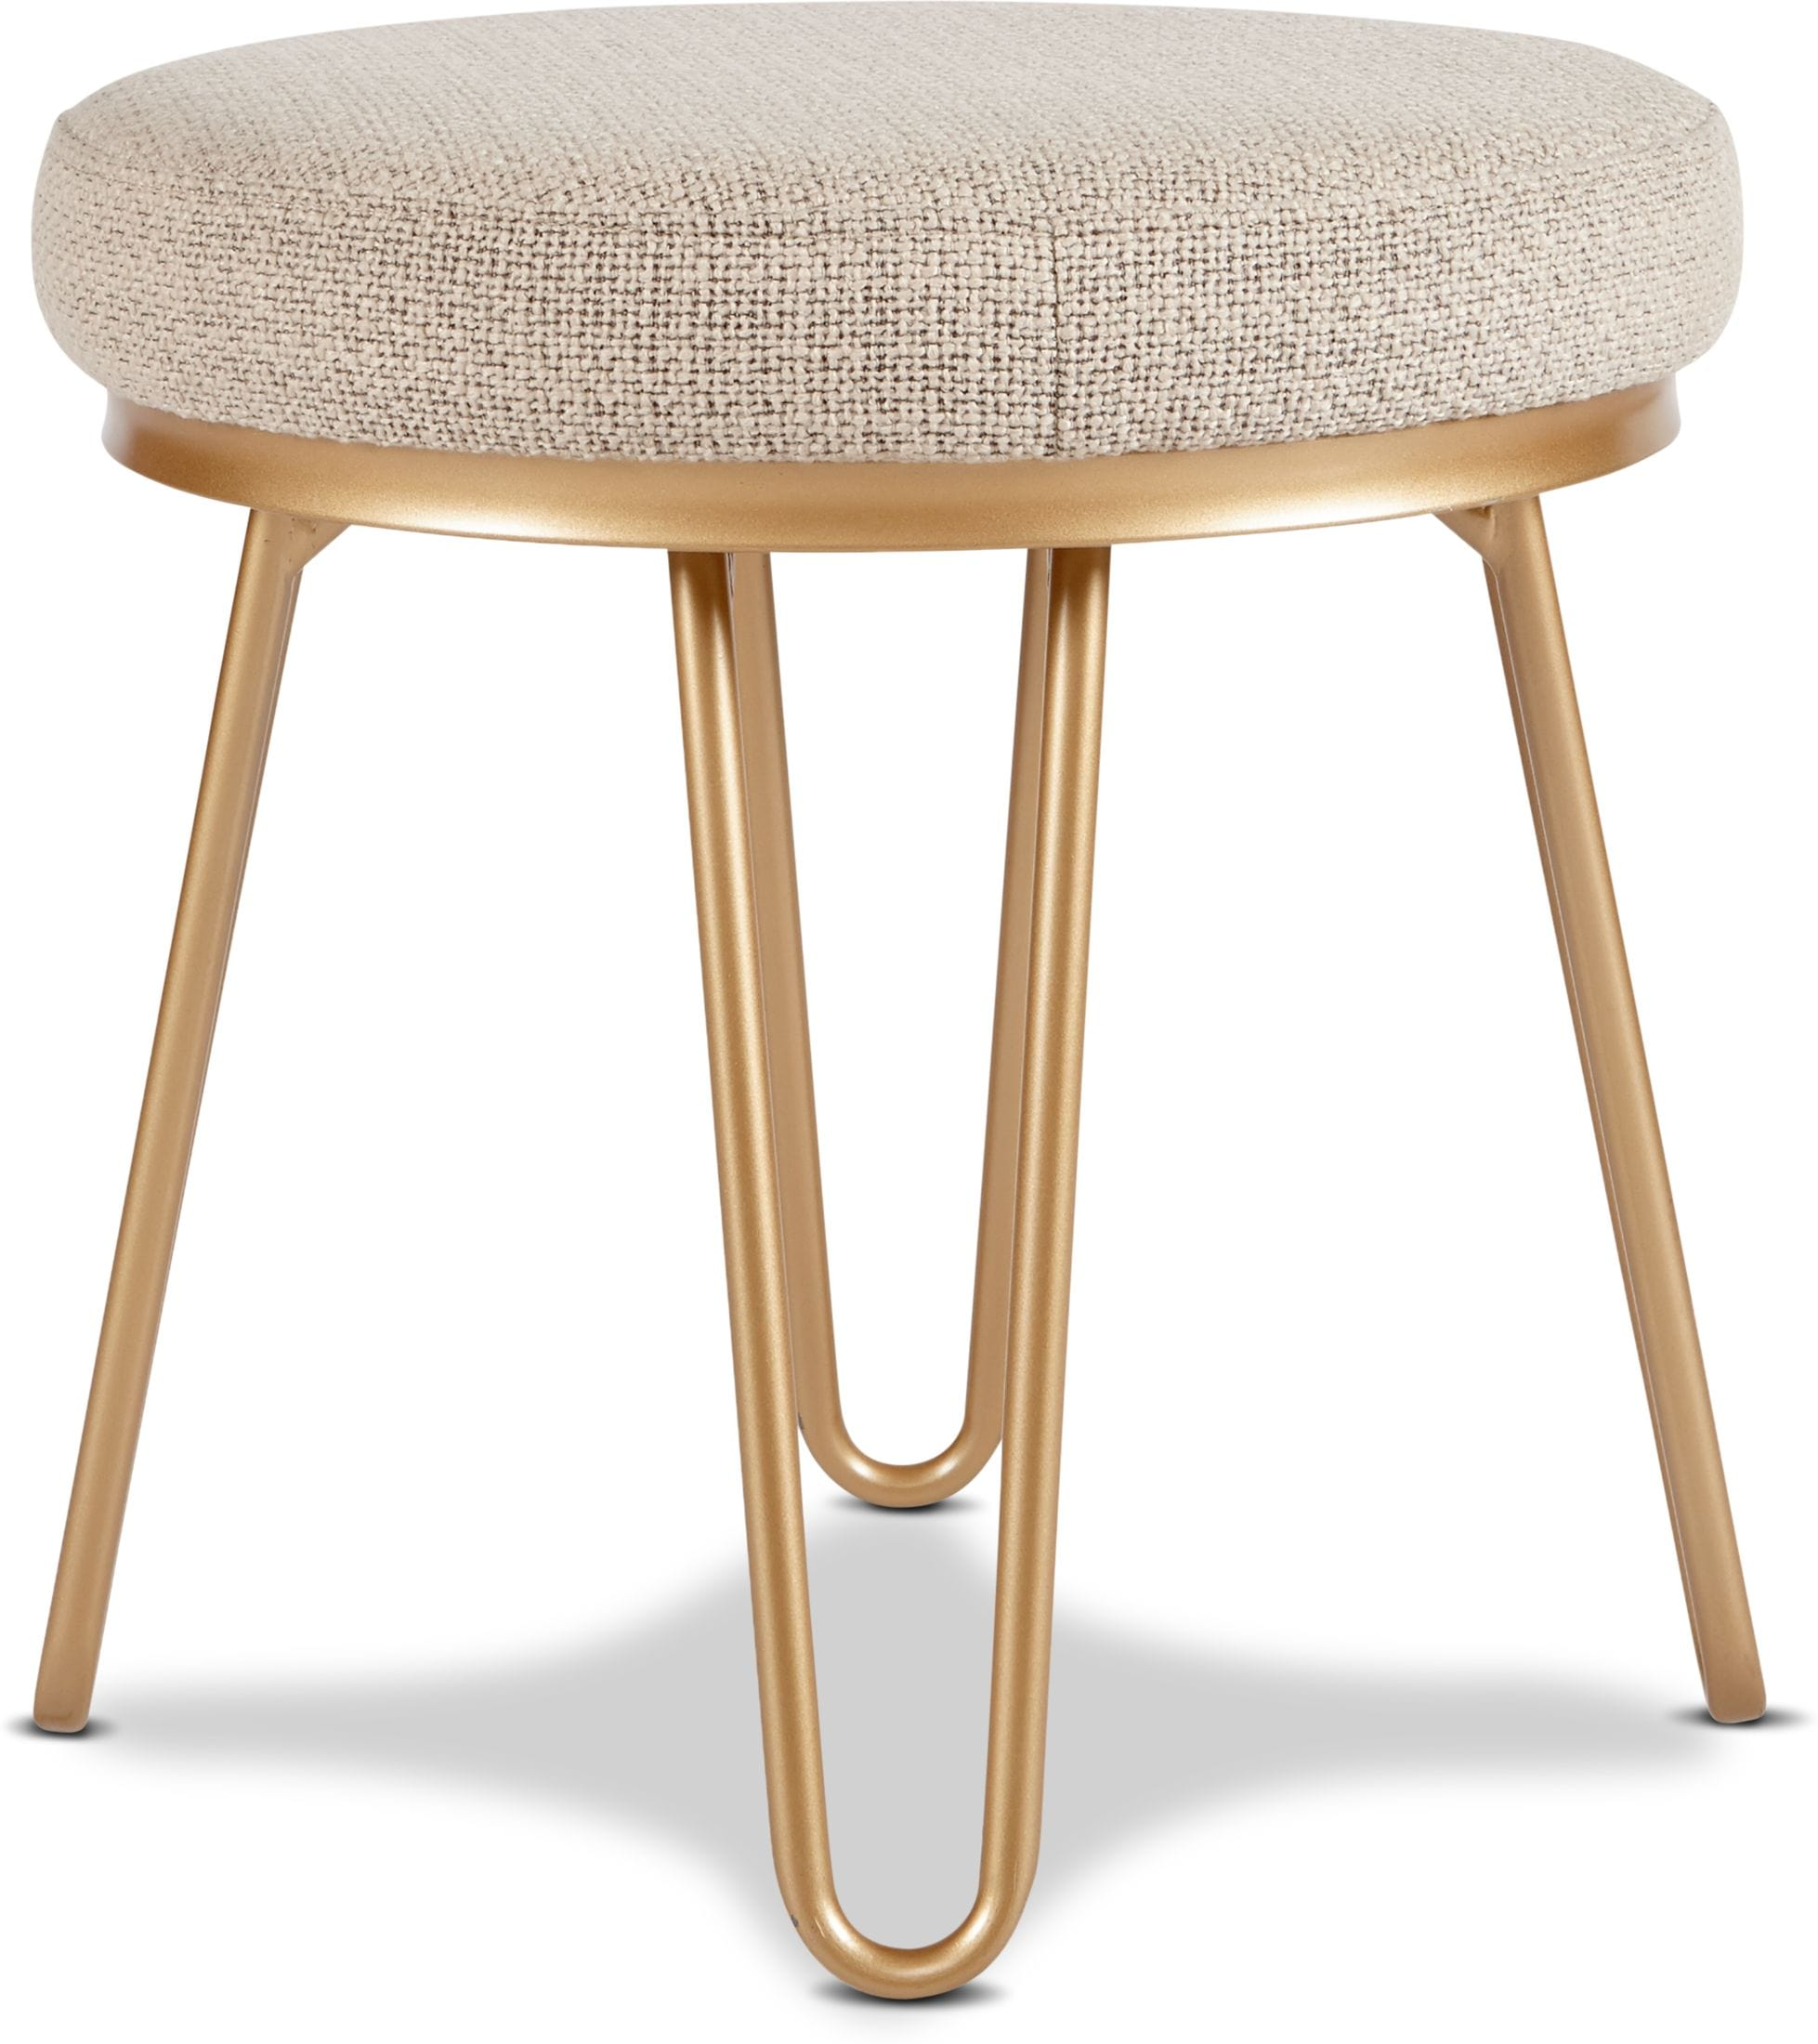 Kids Furniture - Bridget Round Stool